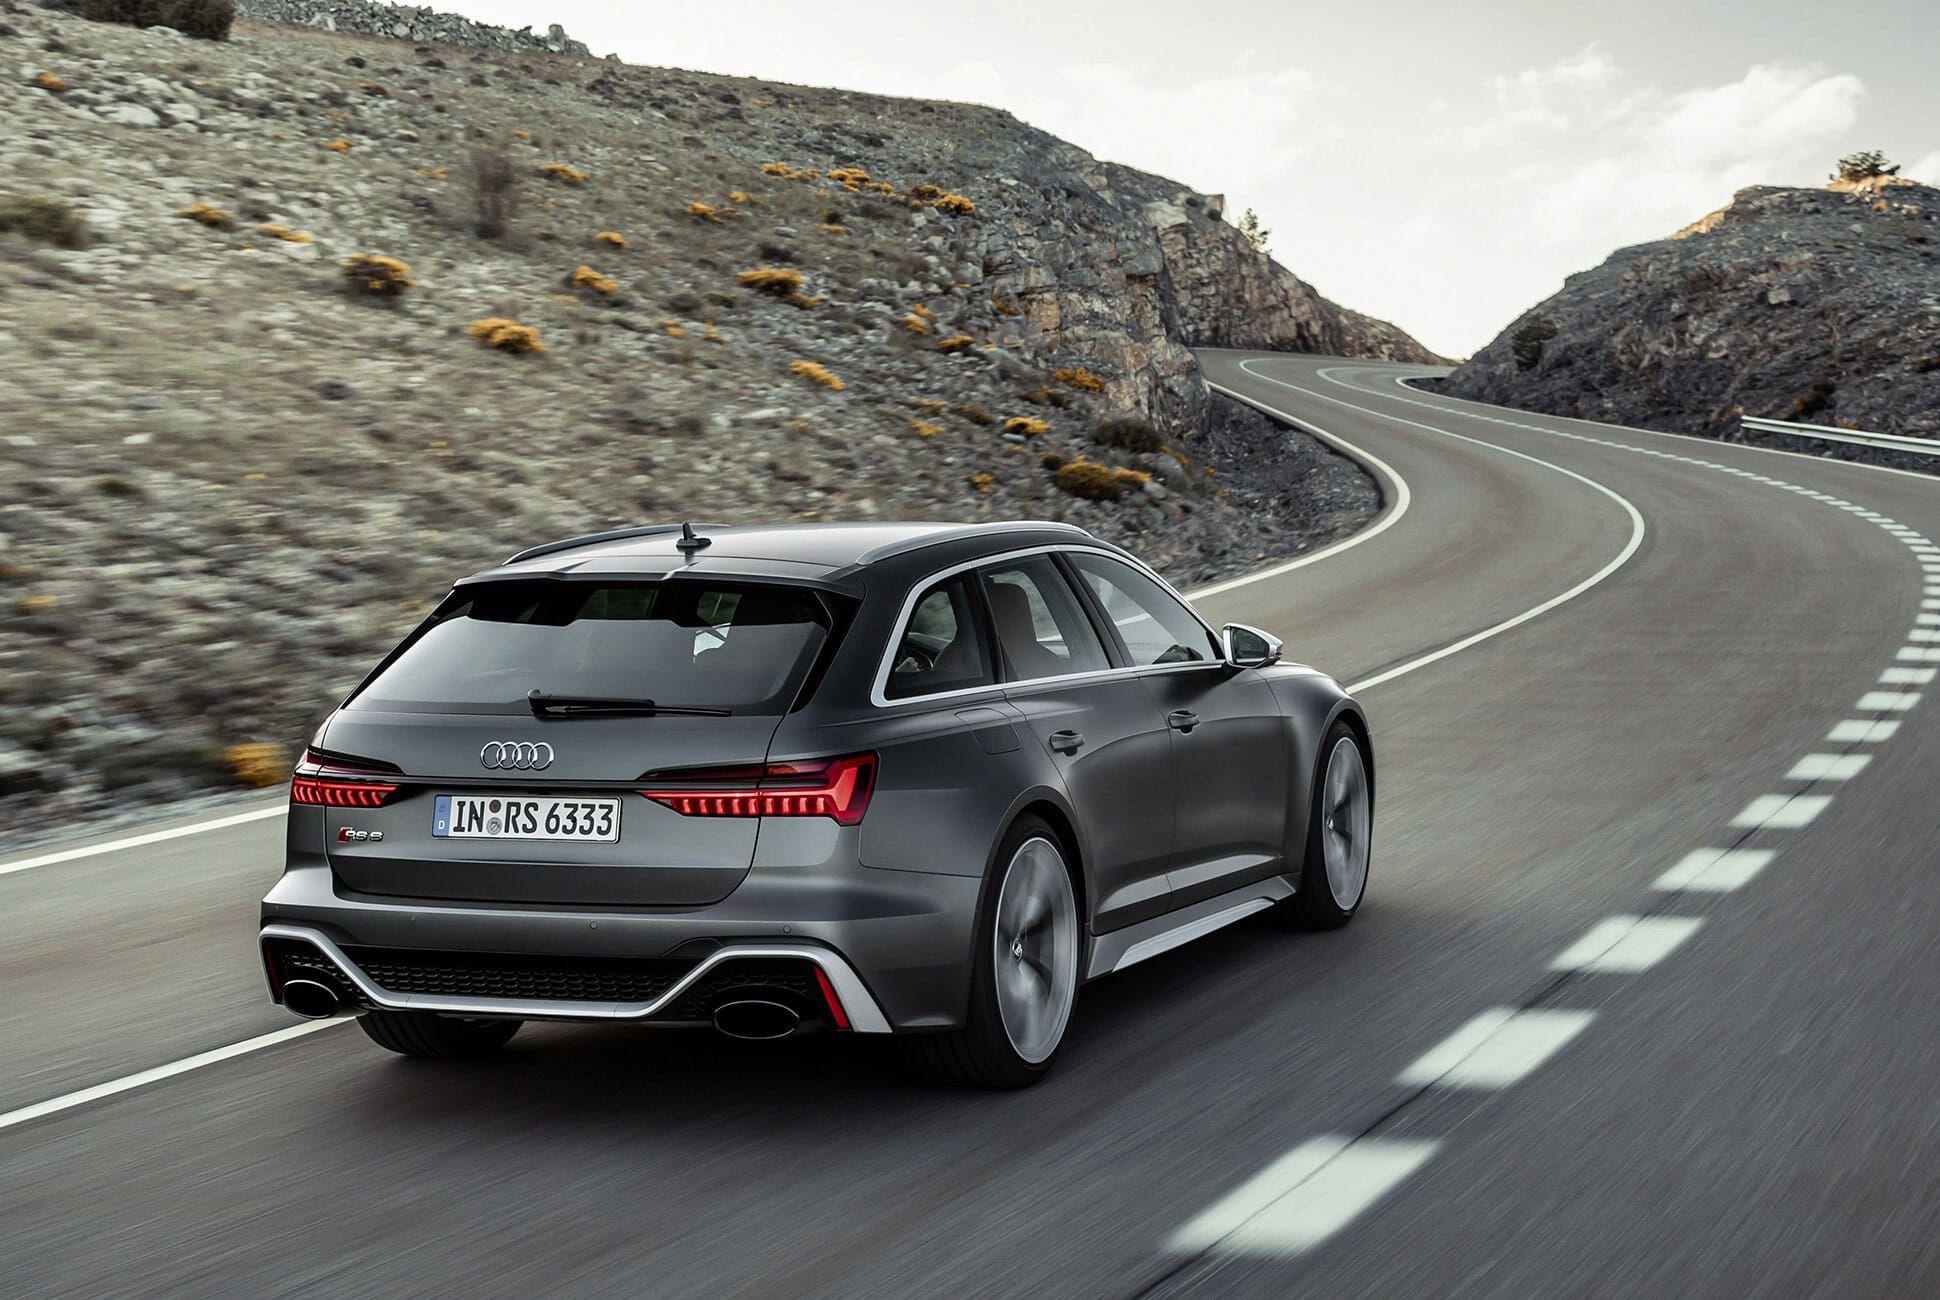 Audi-RS6-Wagon-gear-patrol-slide-8